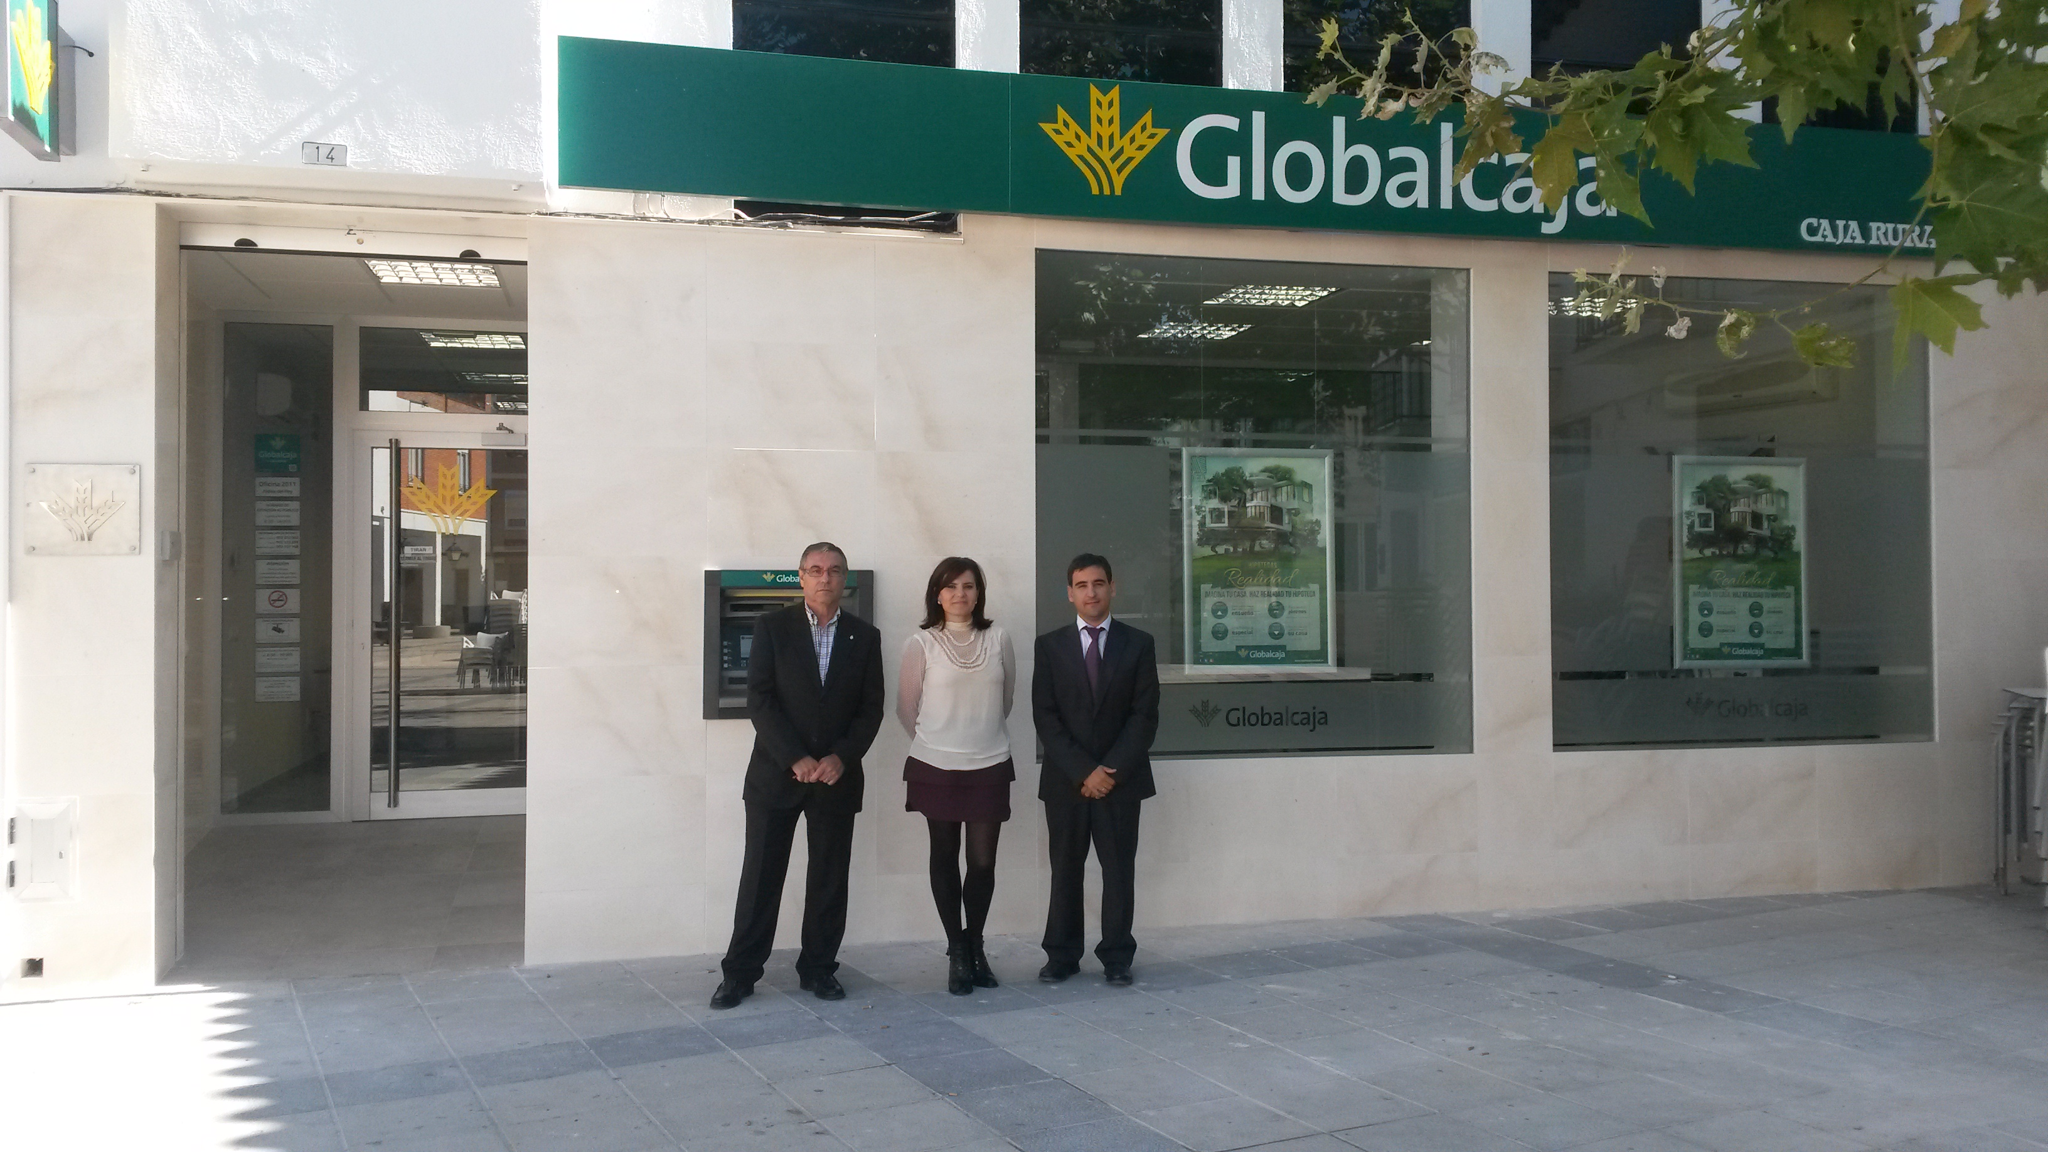 https://blog.globalcaja.es/wp-content/uploads/2015/10/oficina-1.jpg